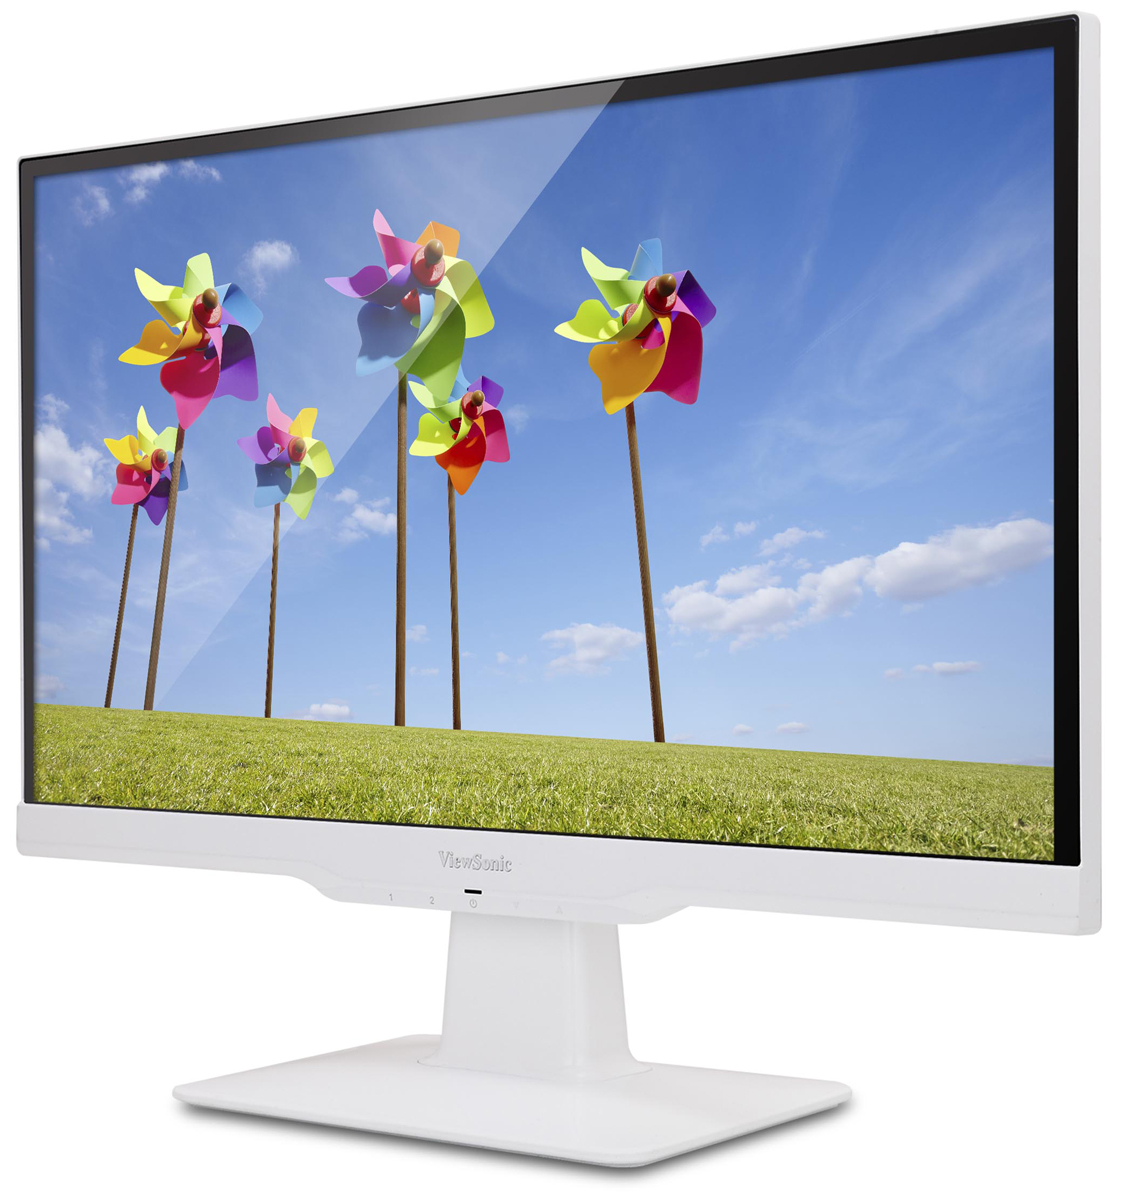 ViewSonic VX2263SMHL, White монитор